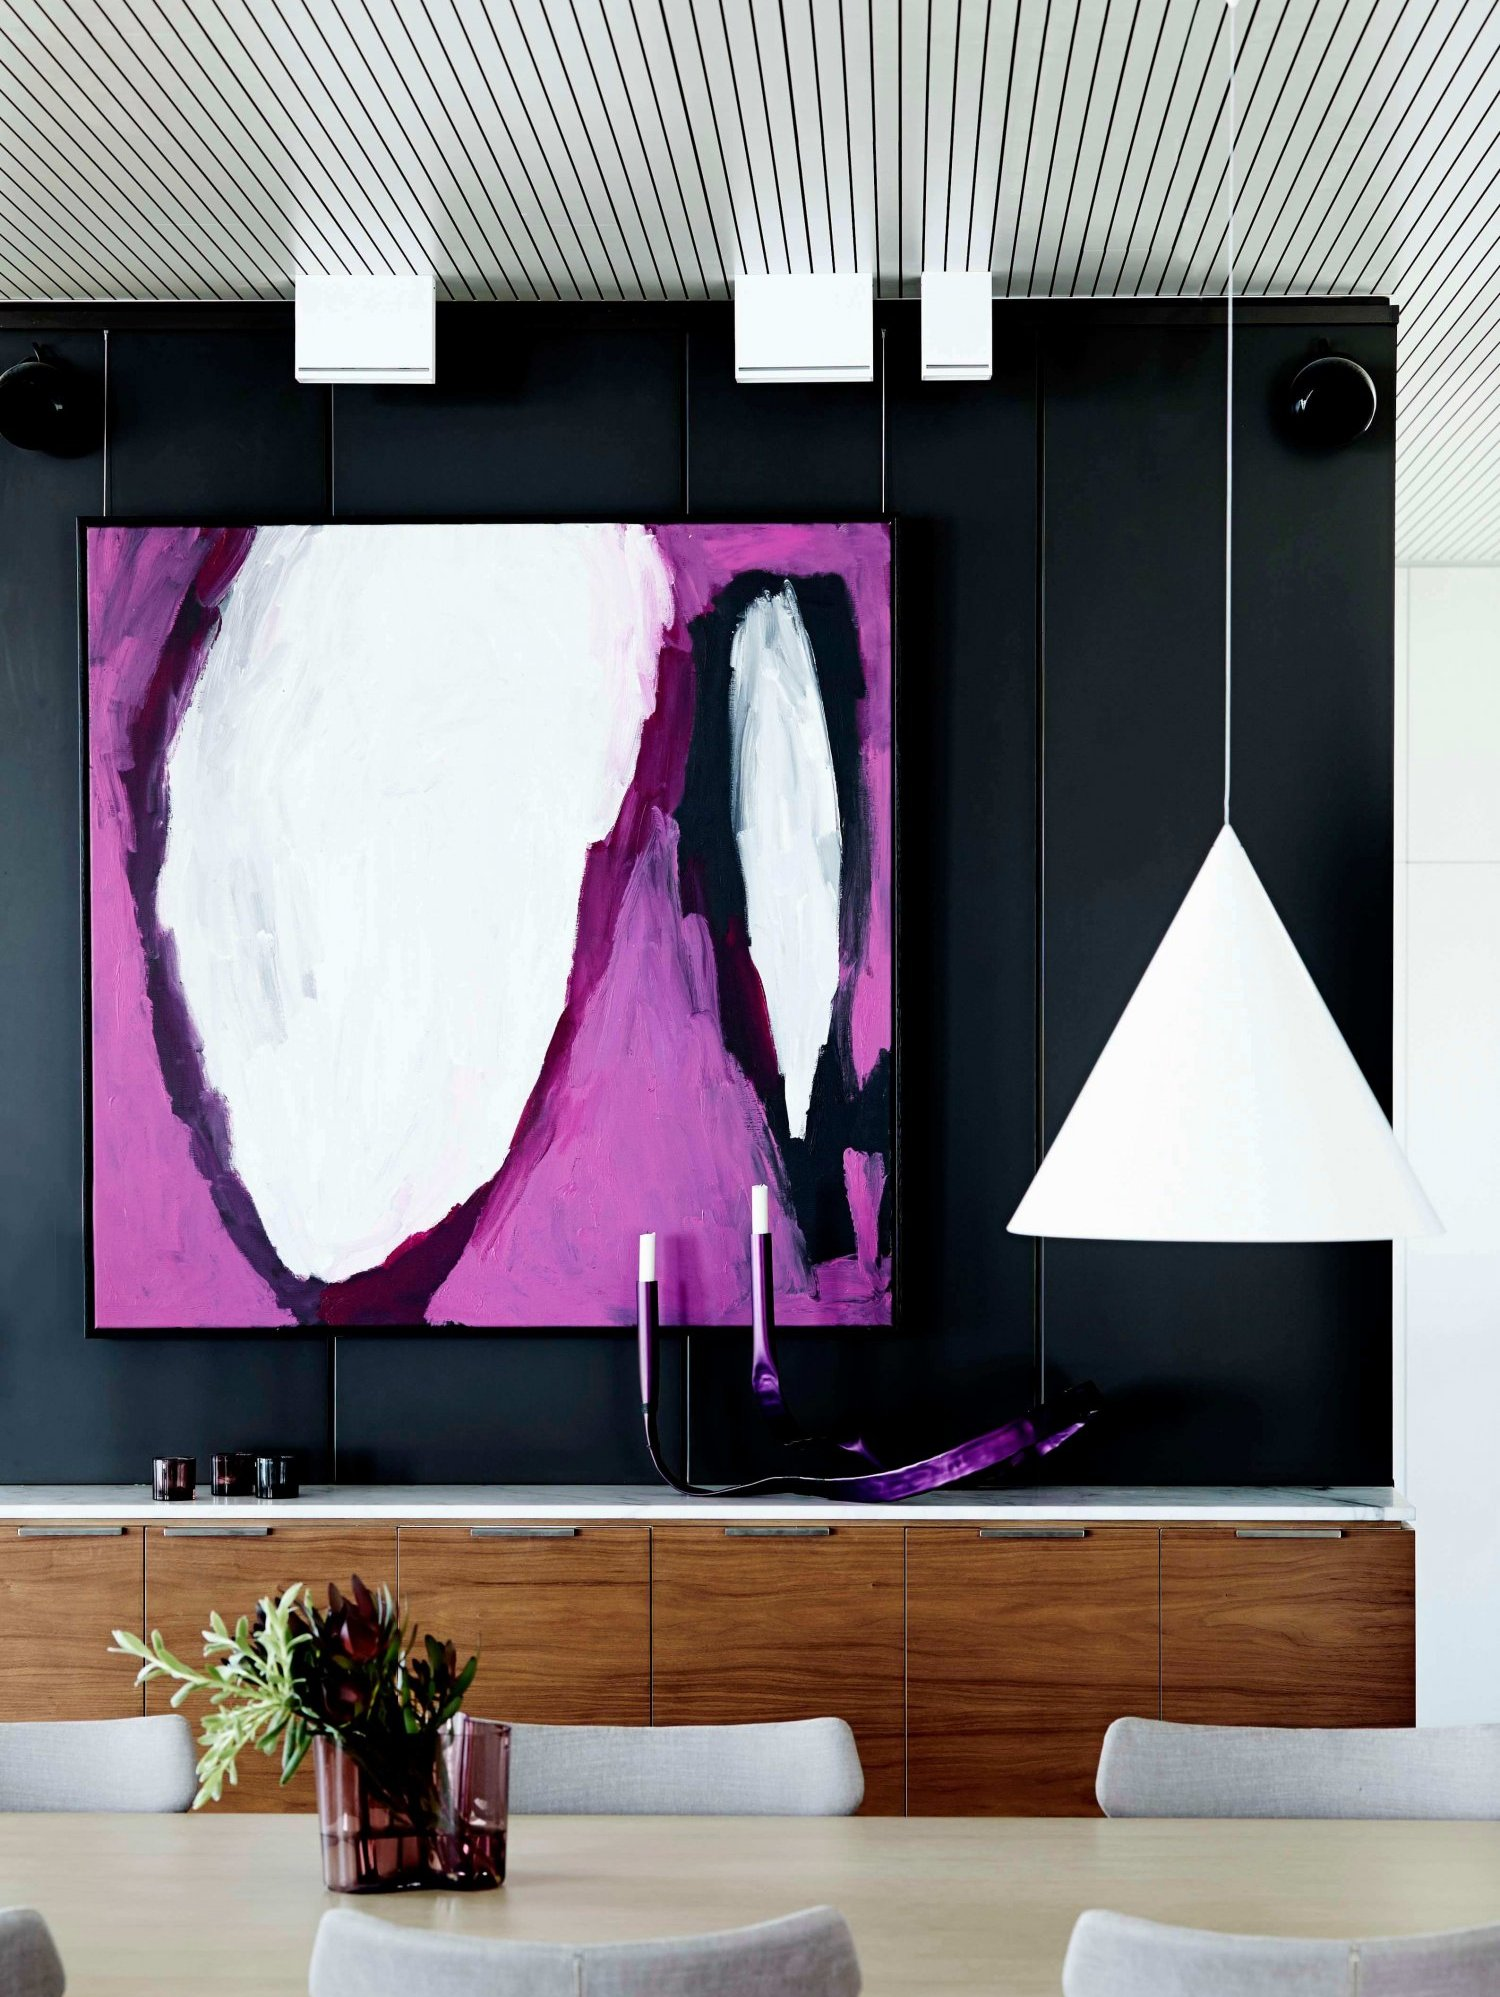 est living Bluff House Lucy Marczyk Nexus Designs 1 e1520555232828